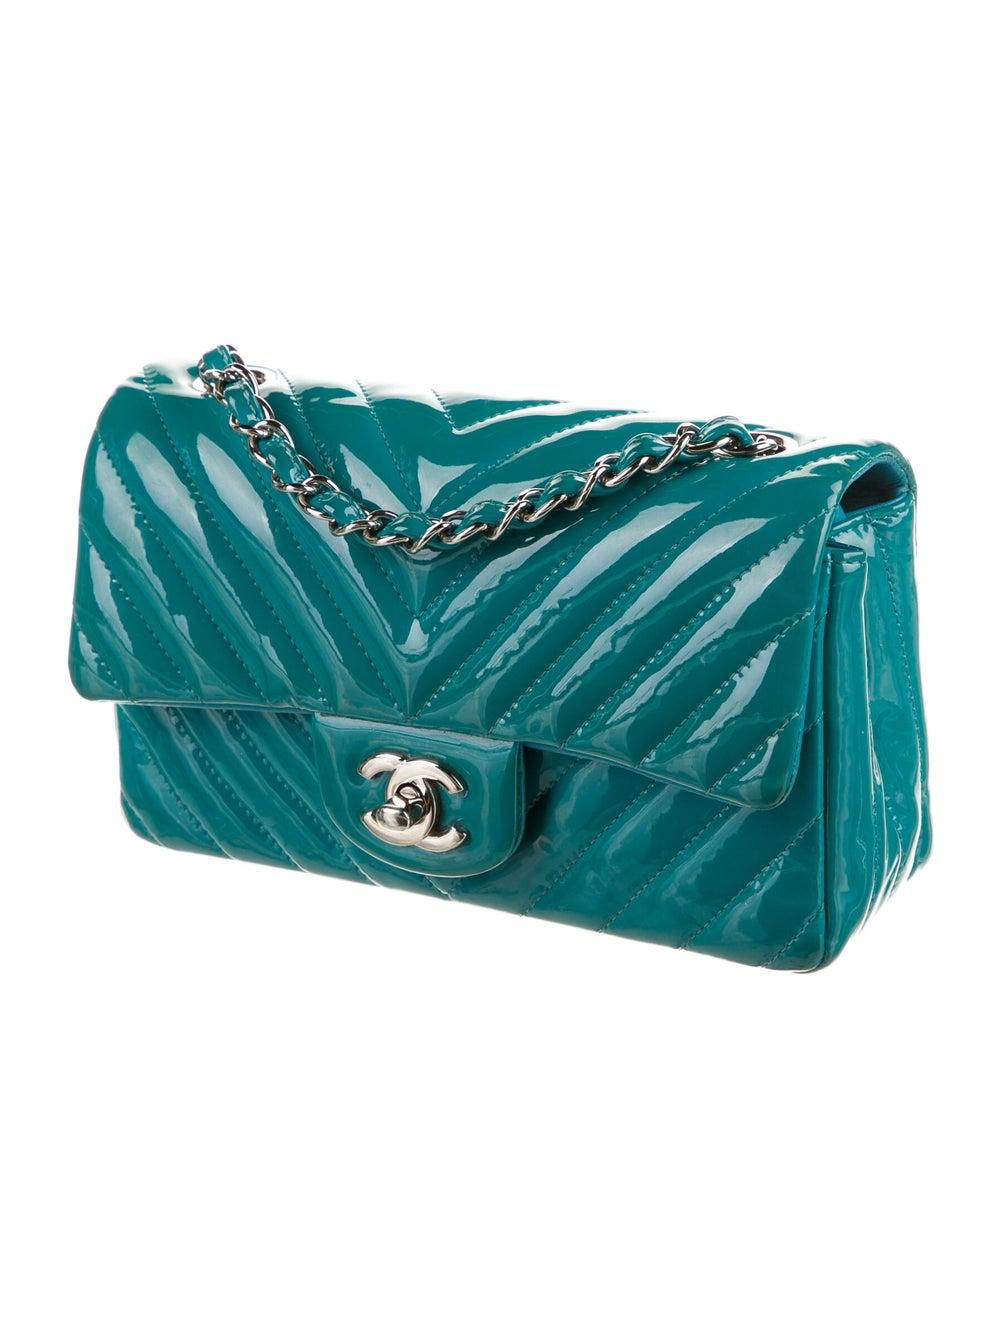 Chanel Classic New Mini Chevron Flap Bag Blue - image 3